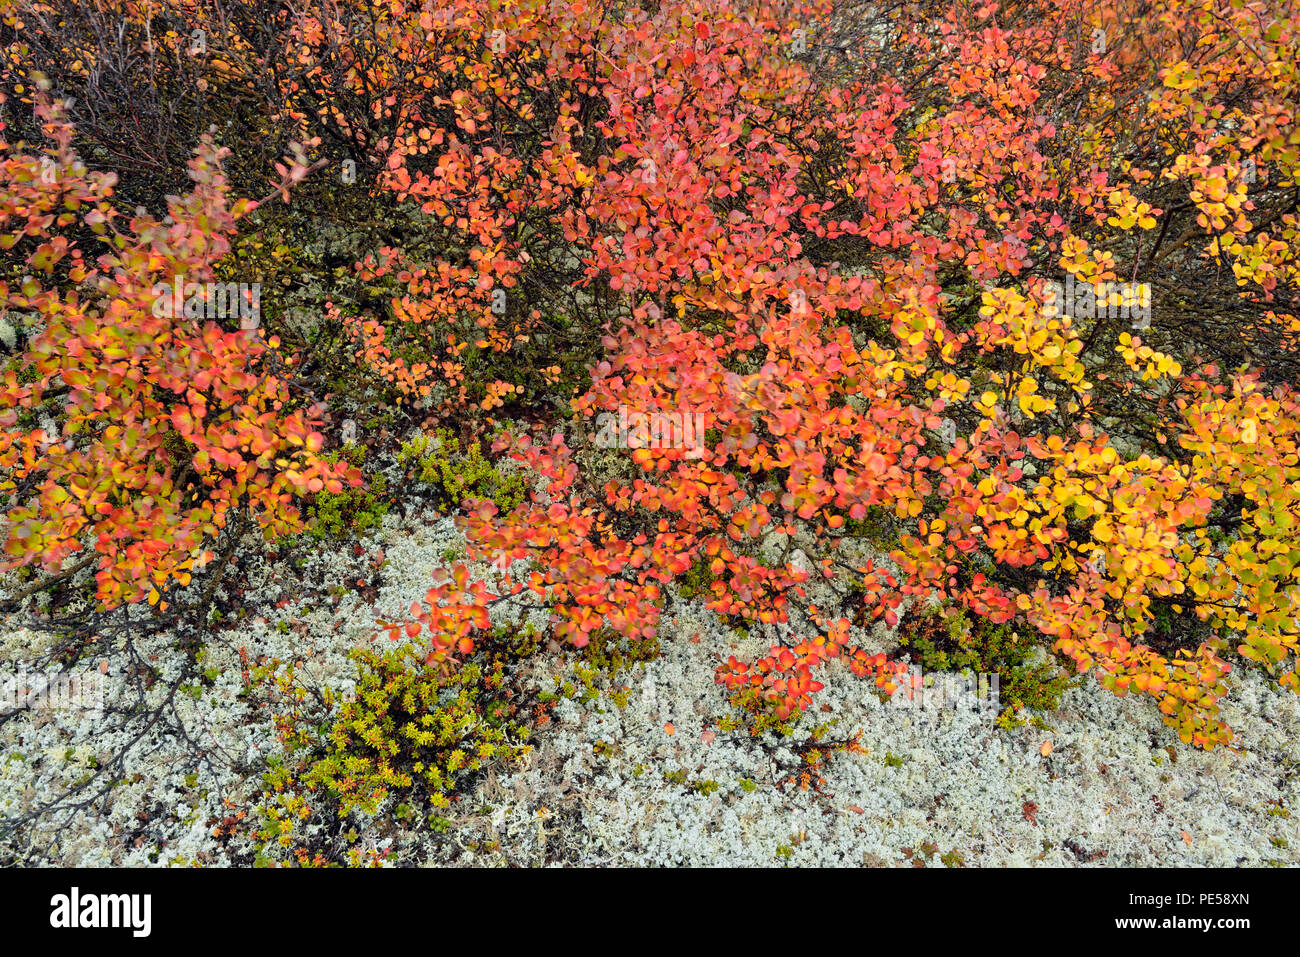 Dwarf birch (Betula nana) Autumn foliage, Arctic Haven Lodge, Nunavut Territory, Canada - Stock Image